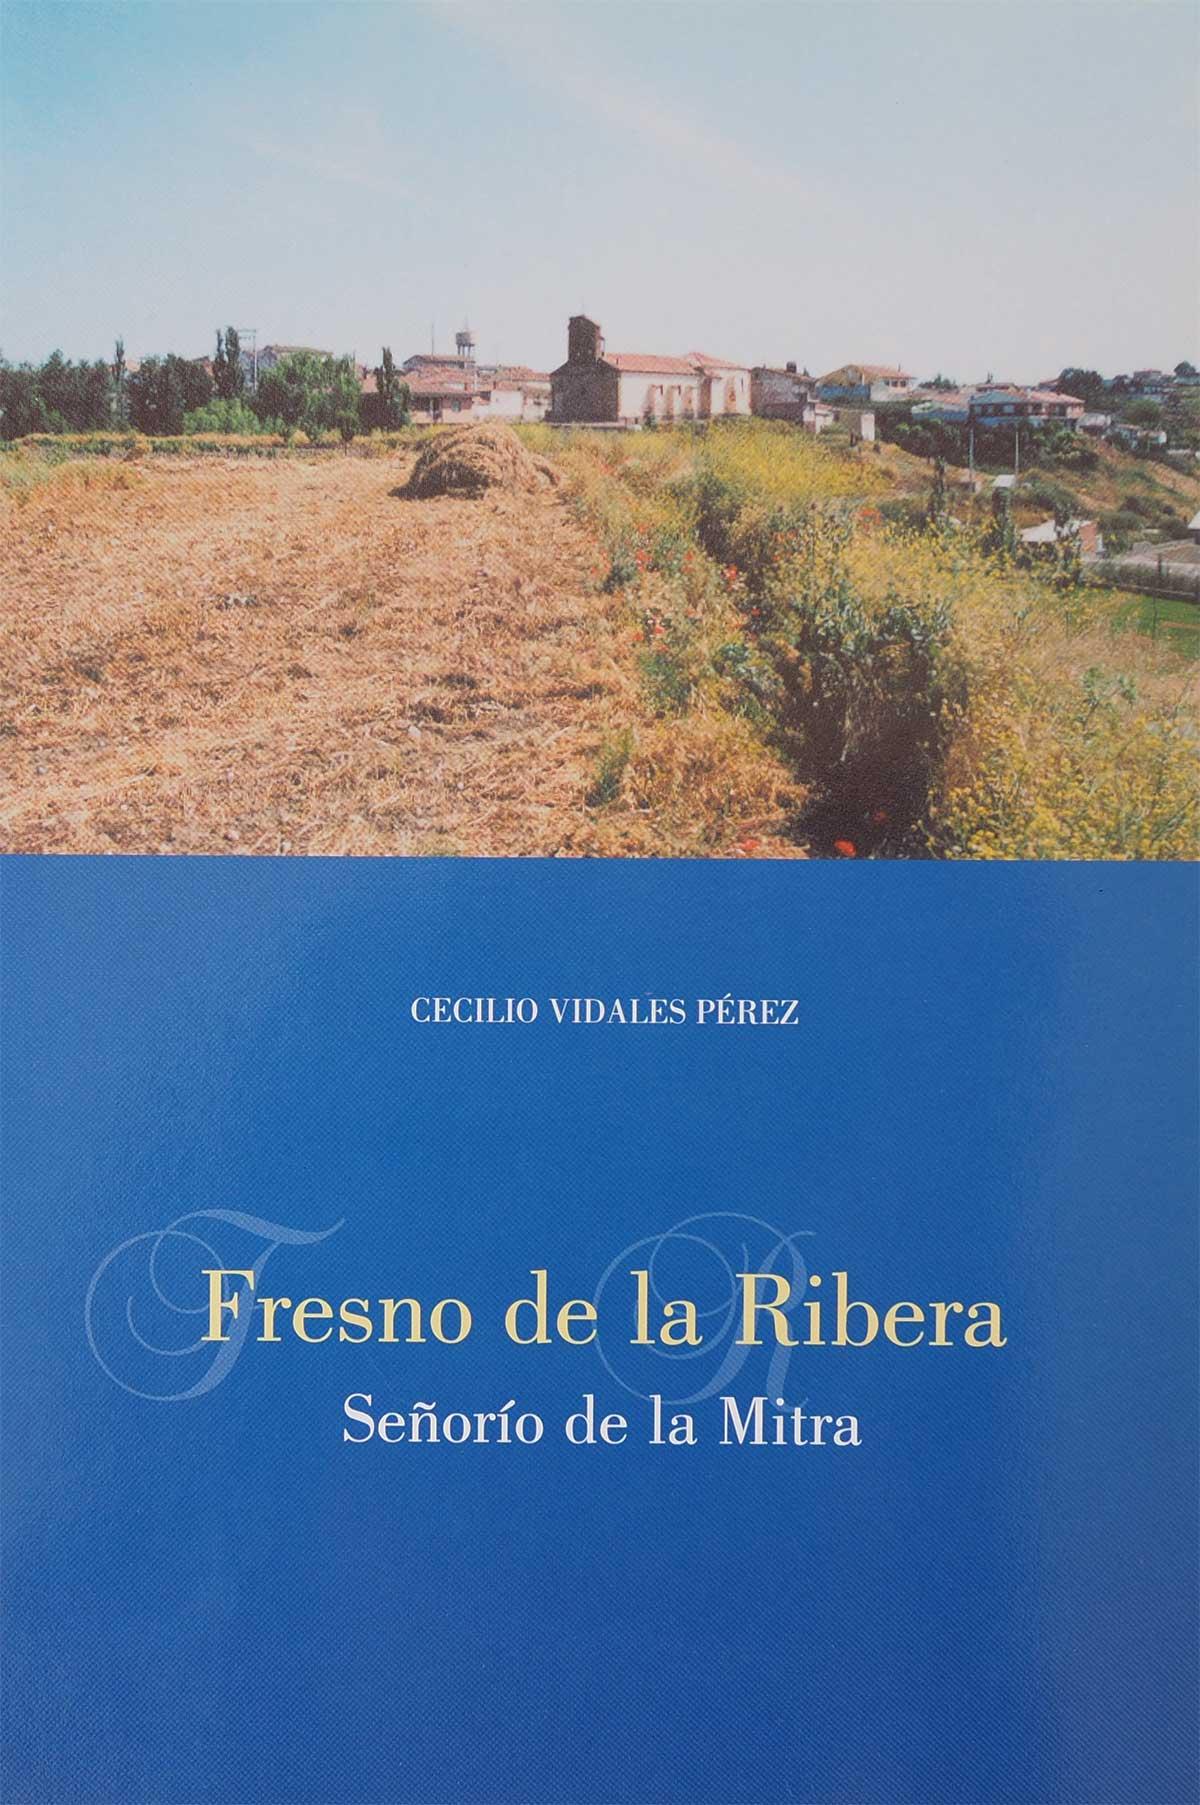 fresno-ribera-senorio-mitra-cecilio-vidales-perez-editorial-semuret